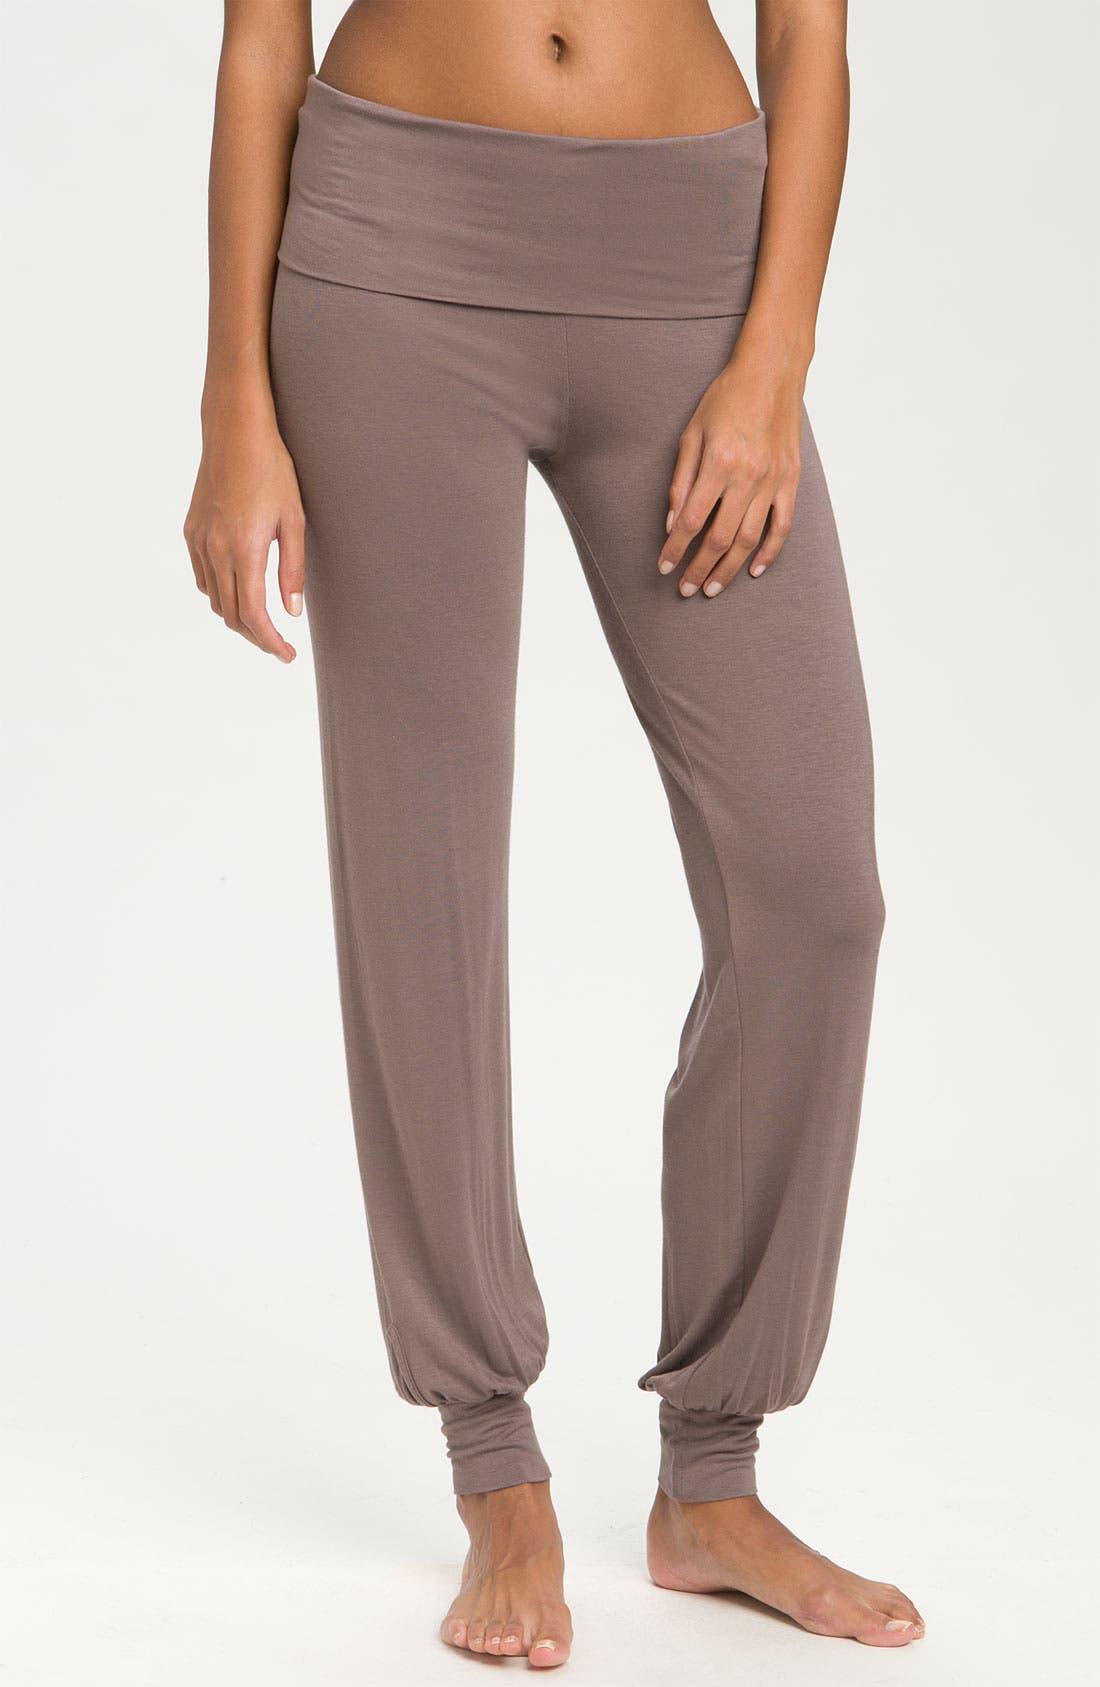 Alternate Image 1 Selected - Kensie 'Darla Dancing Ballet' Knit Pants